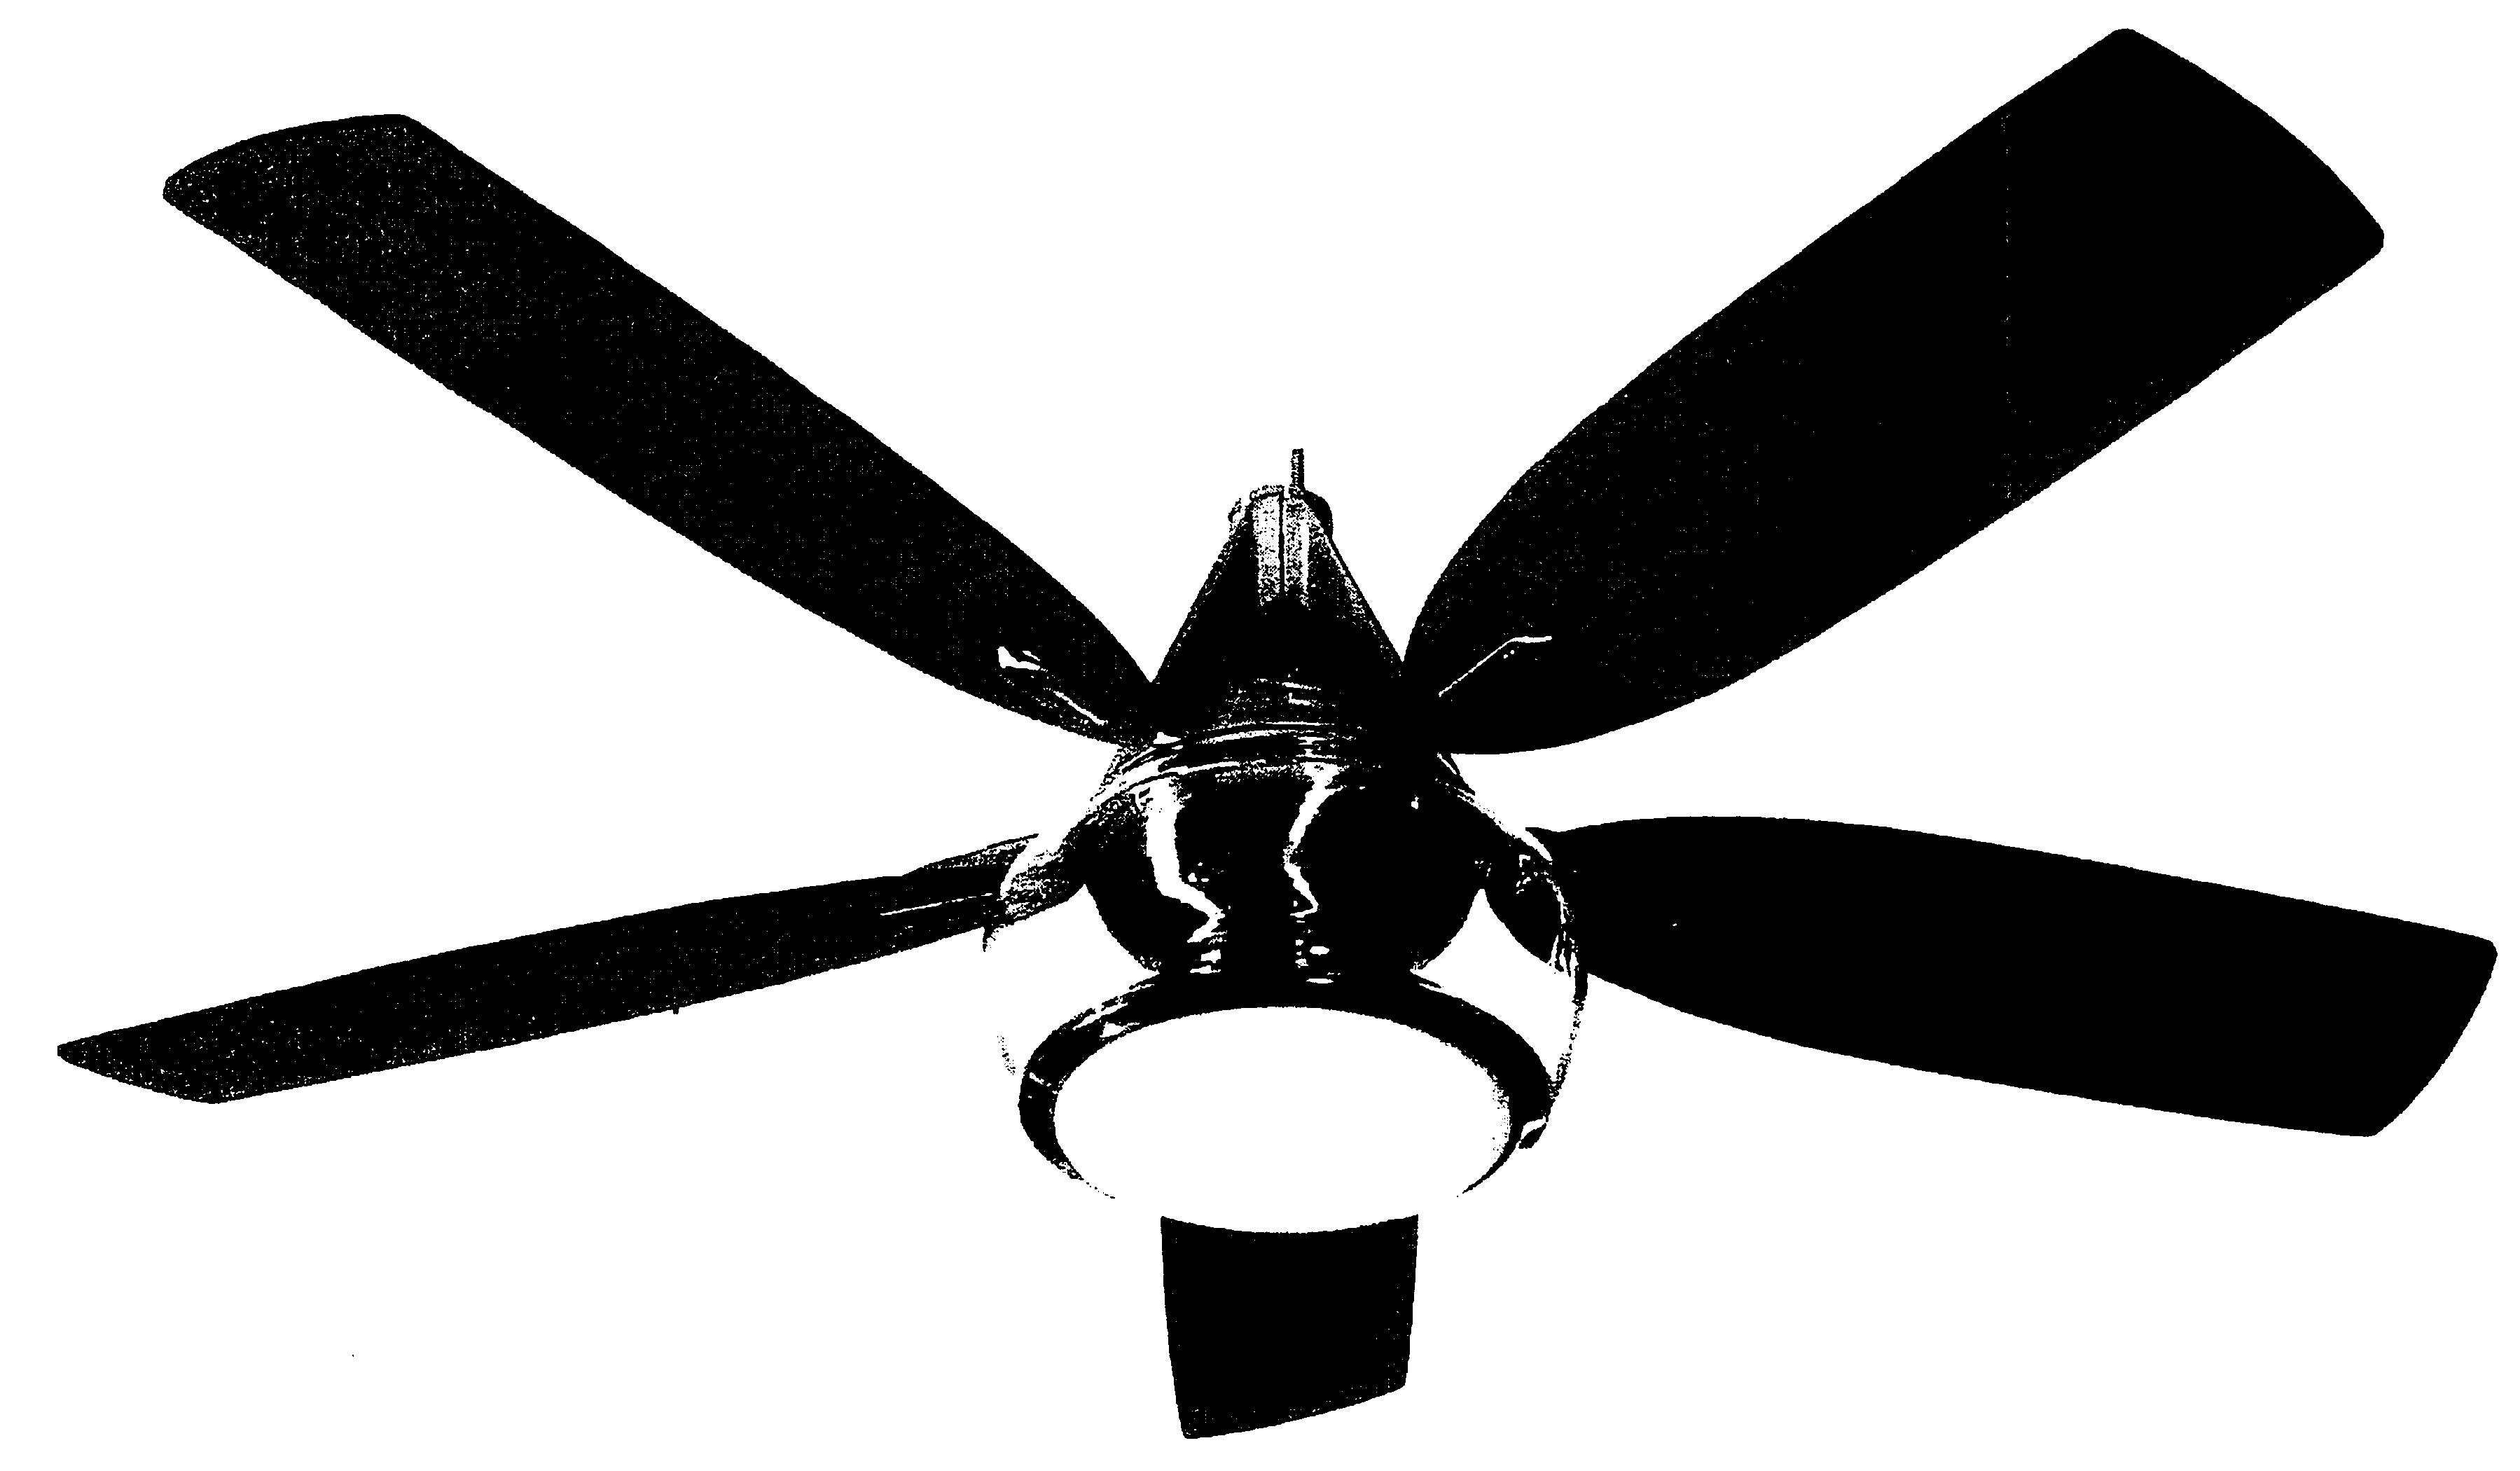 ceiling fan clipart 20700 clipart panda free clipart images rh clipartpanda com Installing Ceiling Fan Clip Art ceiling fan clipart free